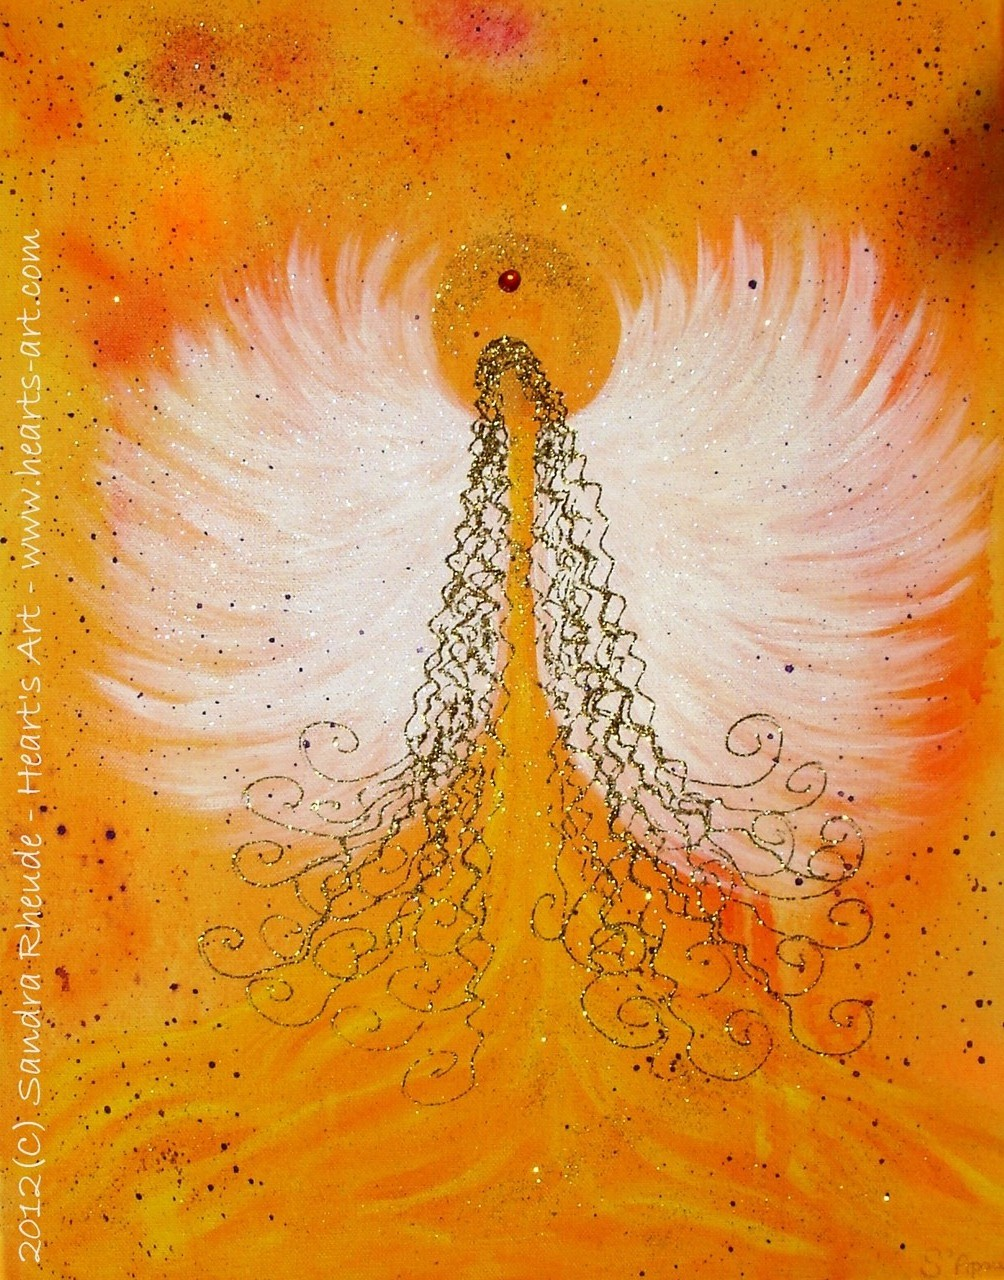 'Phoenix Angel' - 2012/64 - Acryl auf Leinwand - 40 x 50 cm - verkauft (Abu Dhabi)